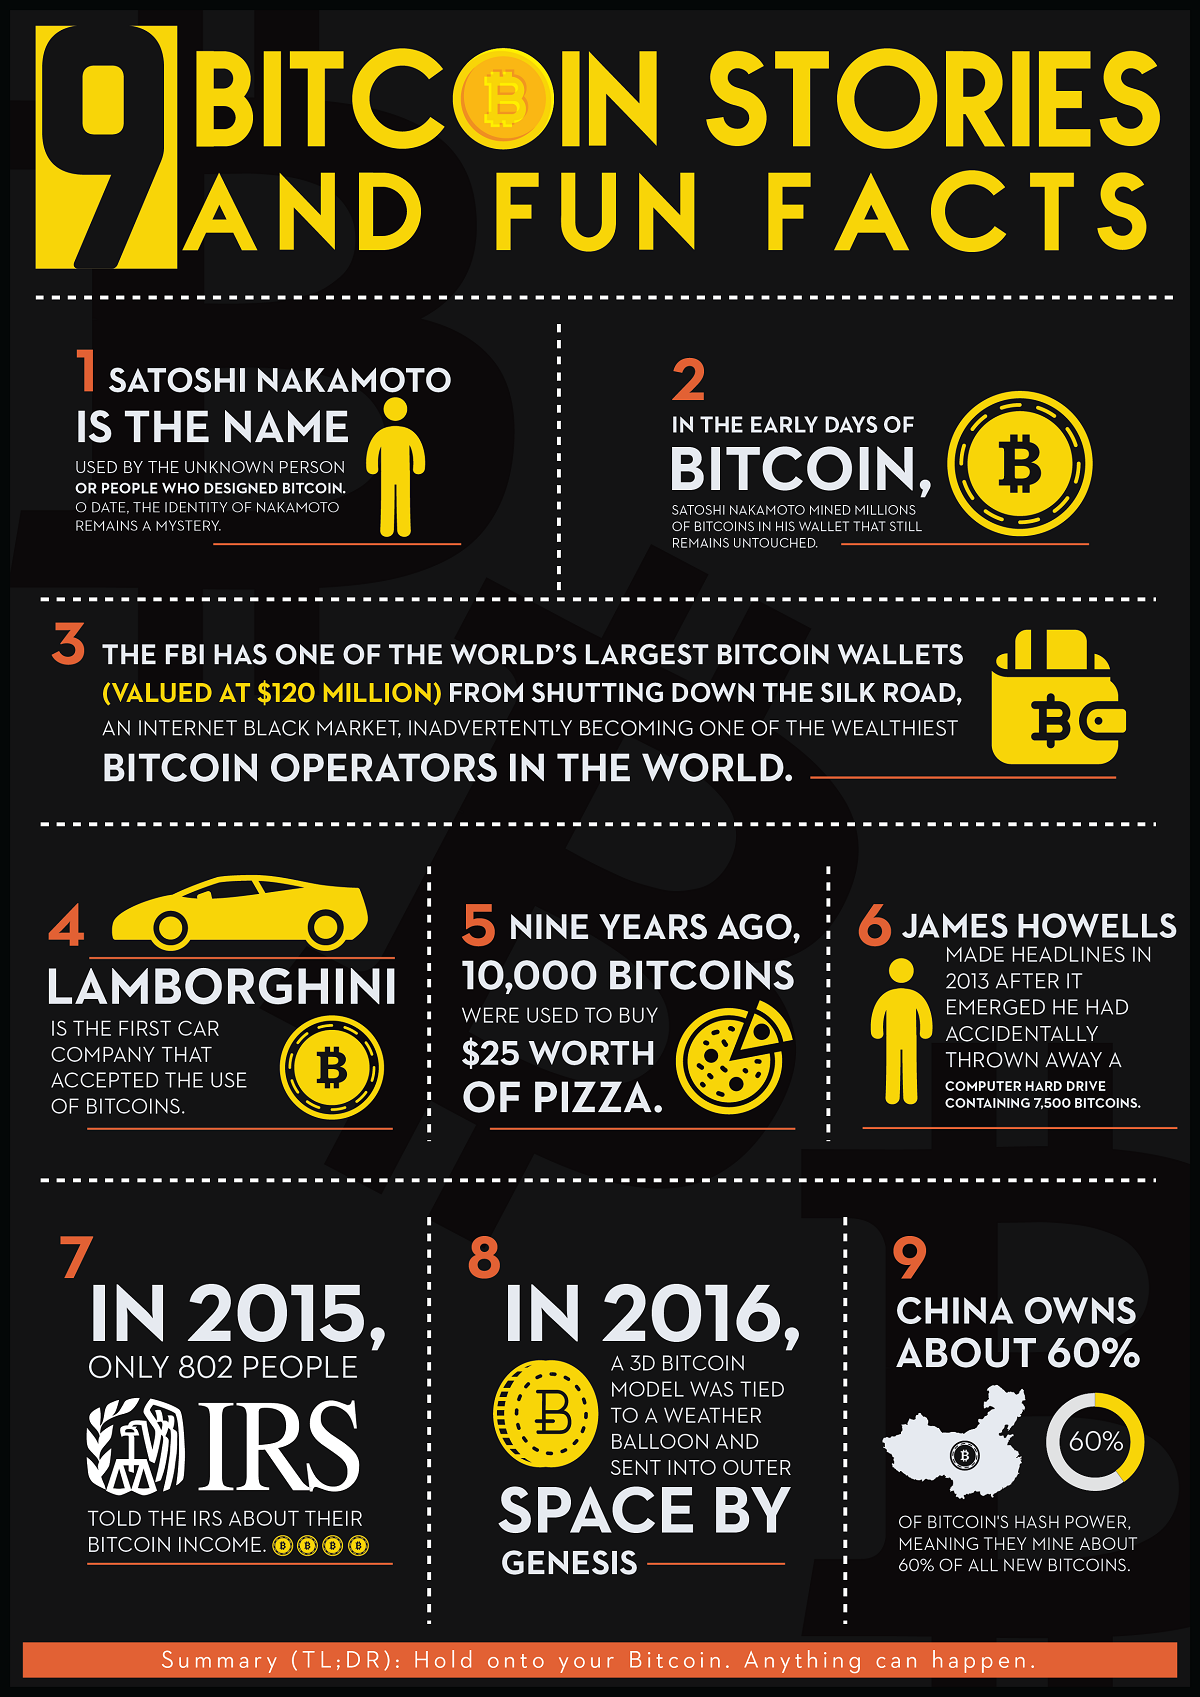 befektetés a bitcoin csaptelepbe